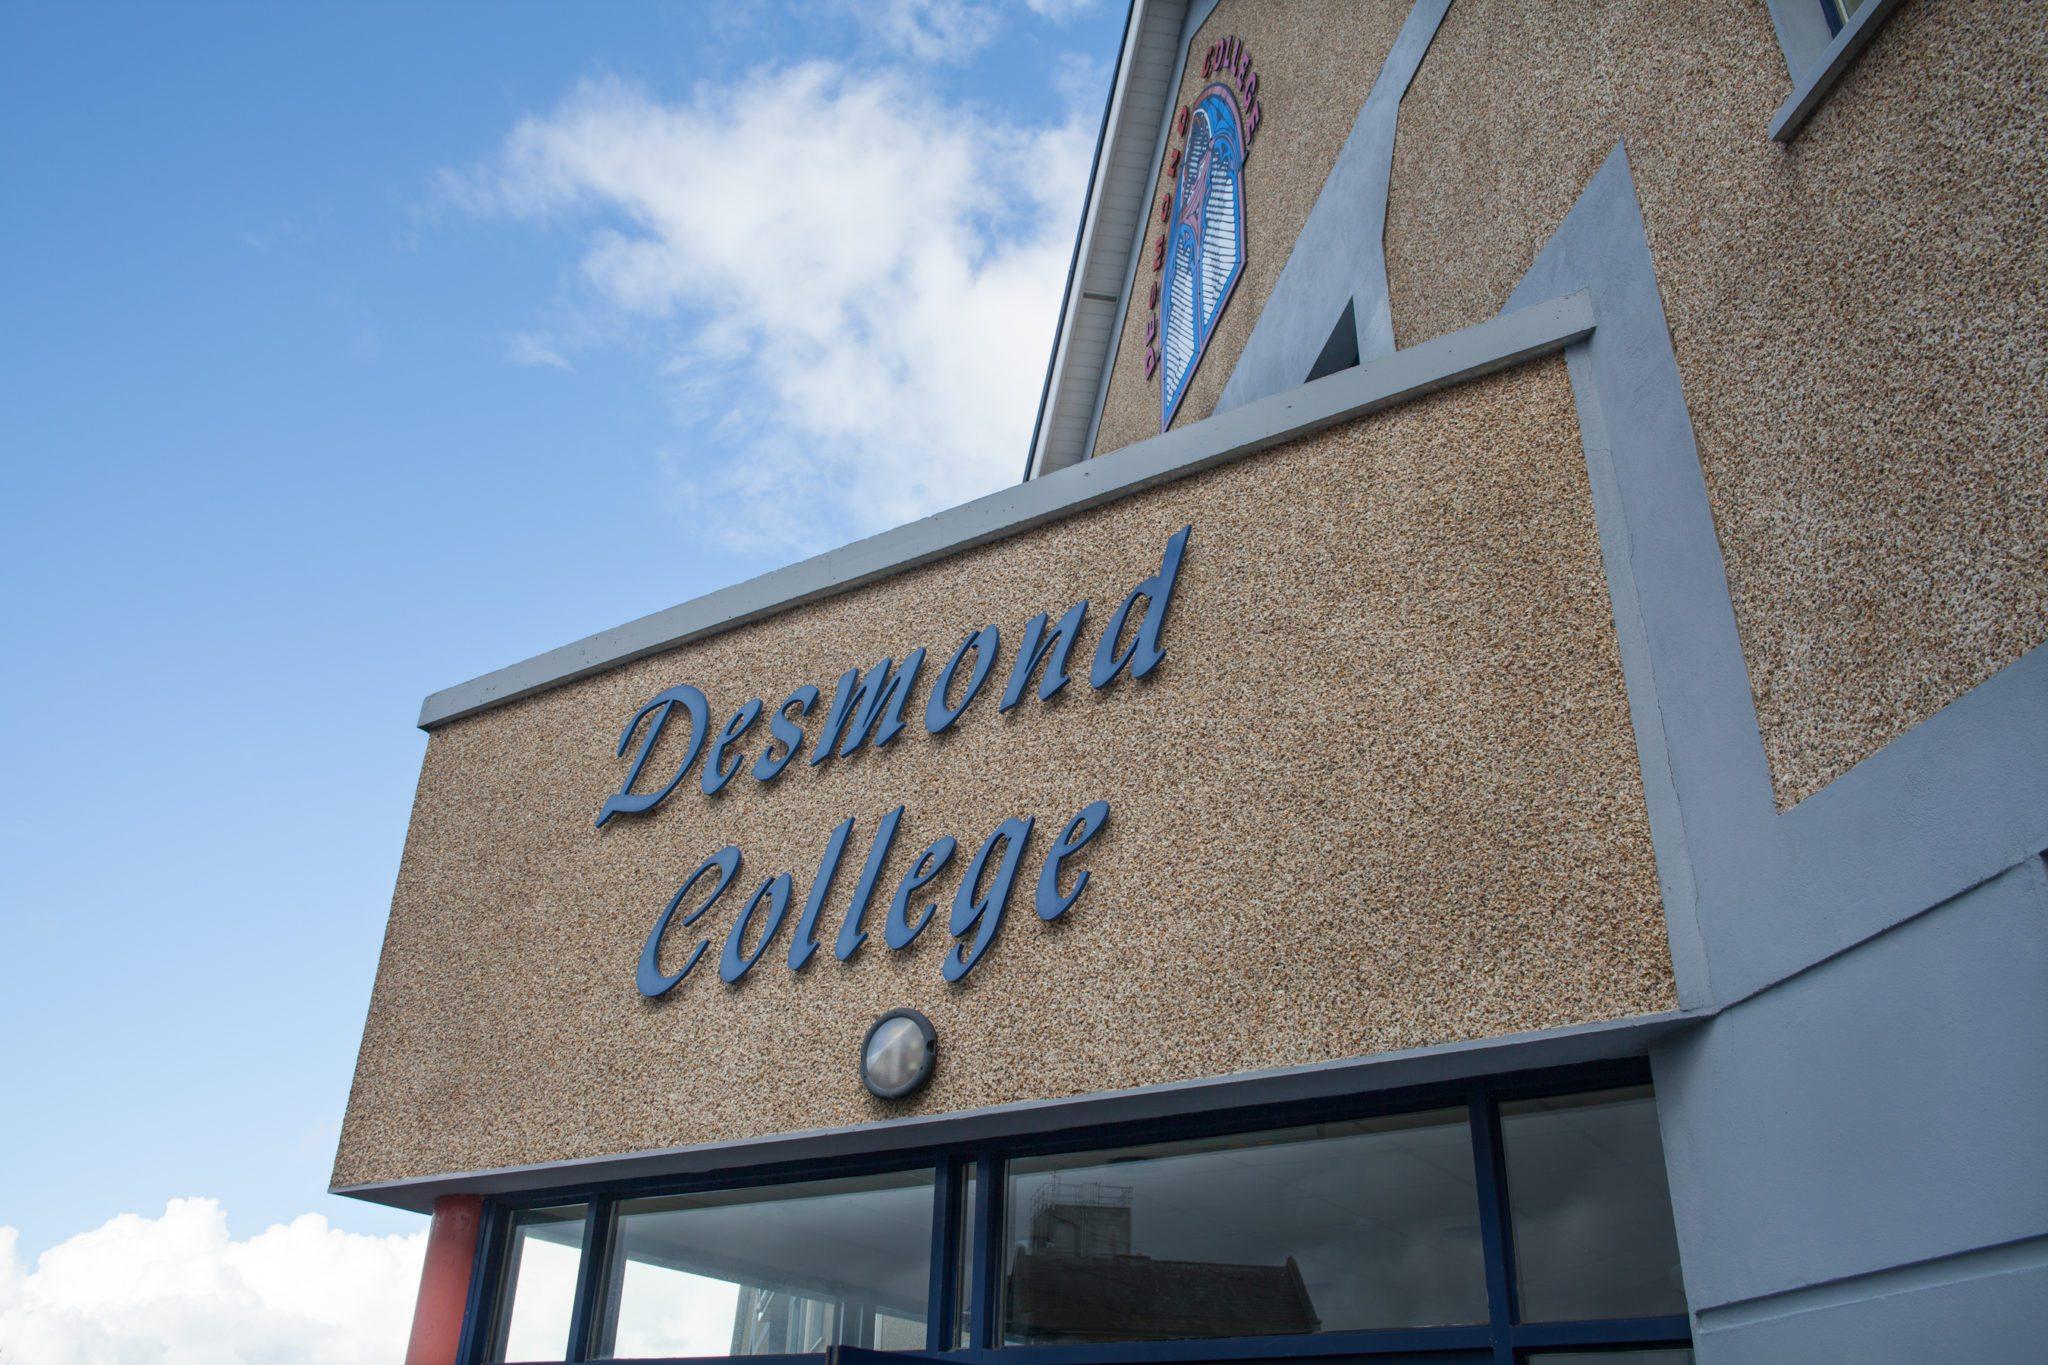 Desmond College, Newcastle West, County Limerick